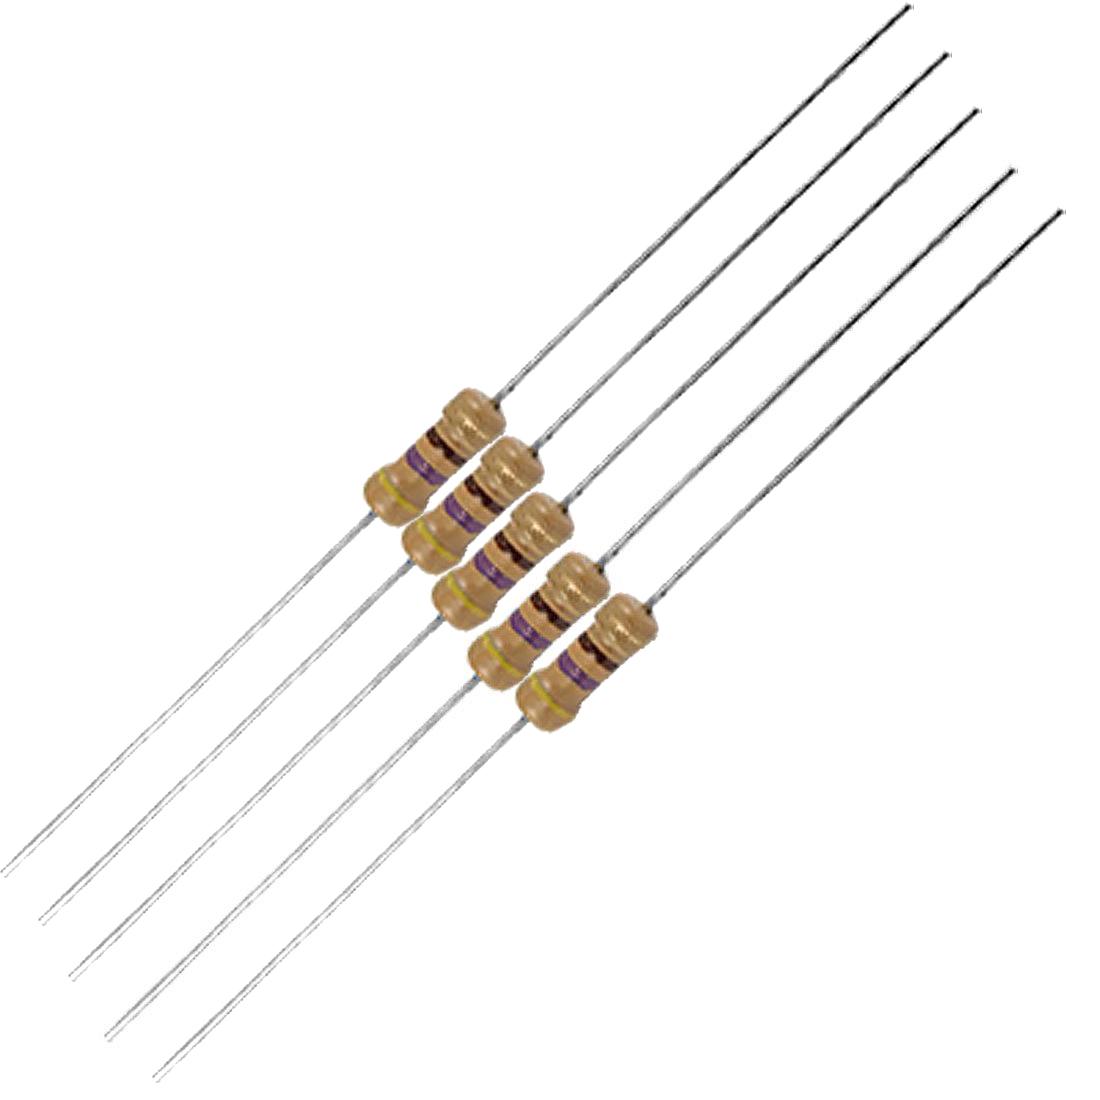 1000 Pcs 1 4w 250v 470 Ohm 4 Bands Carbon Film Resistors